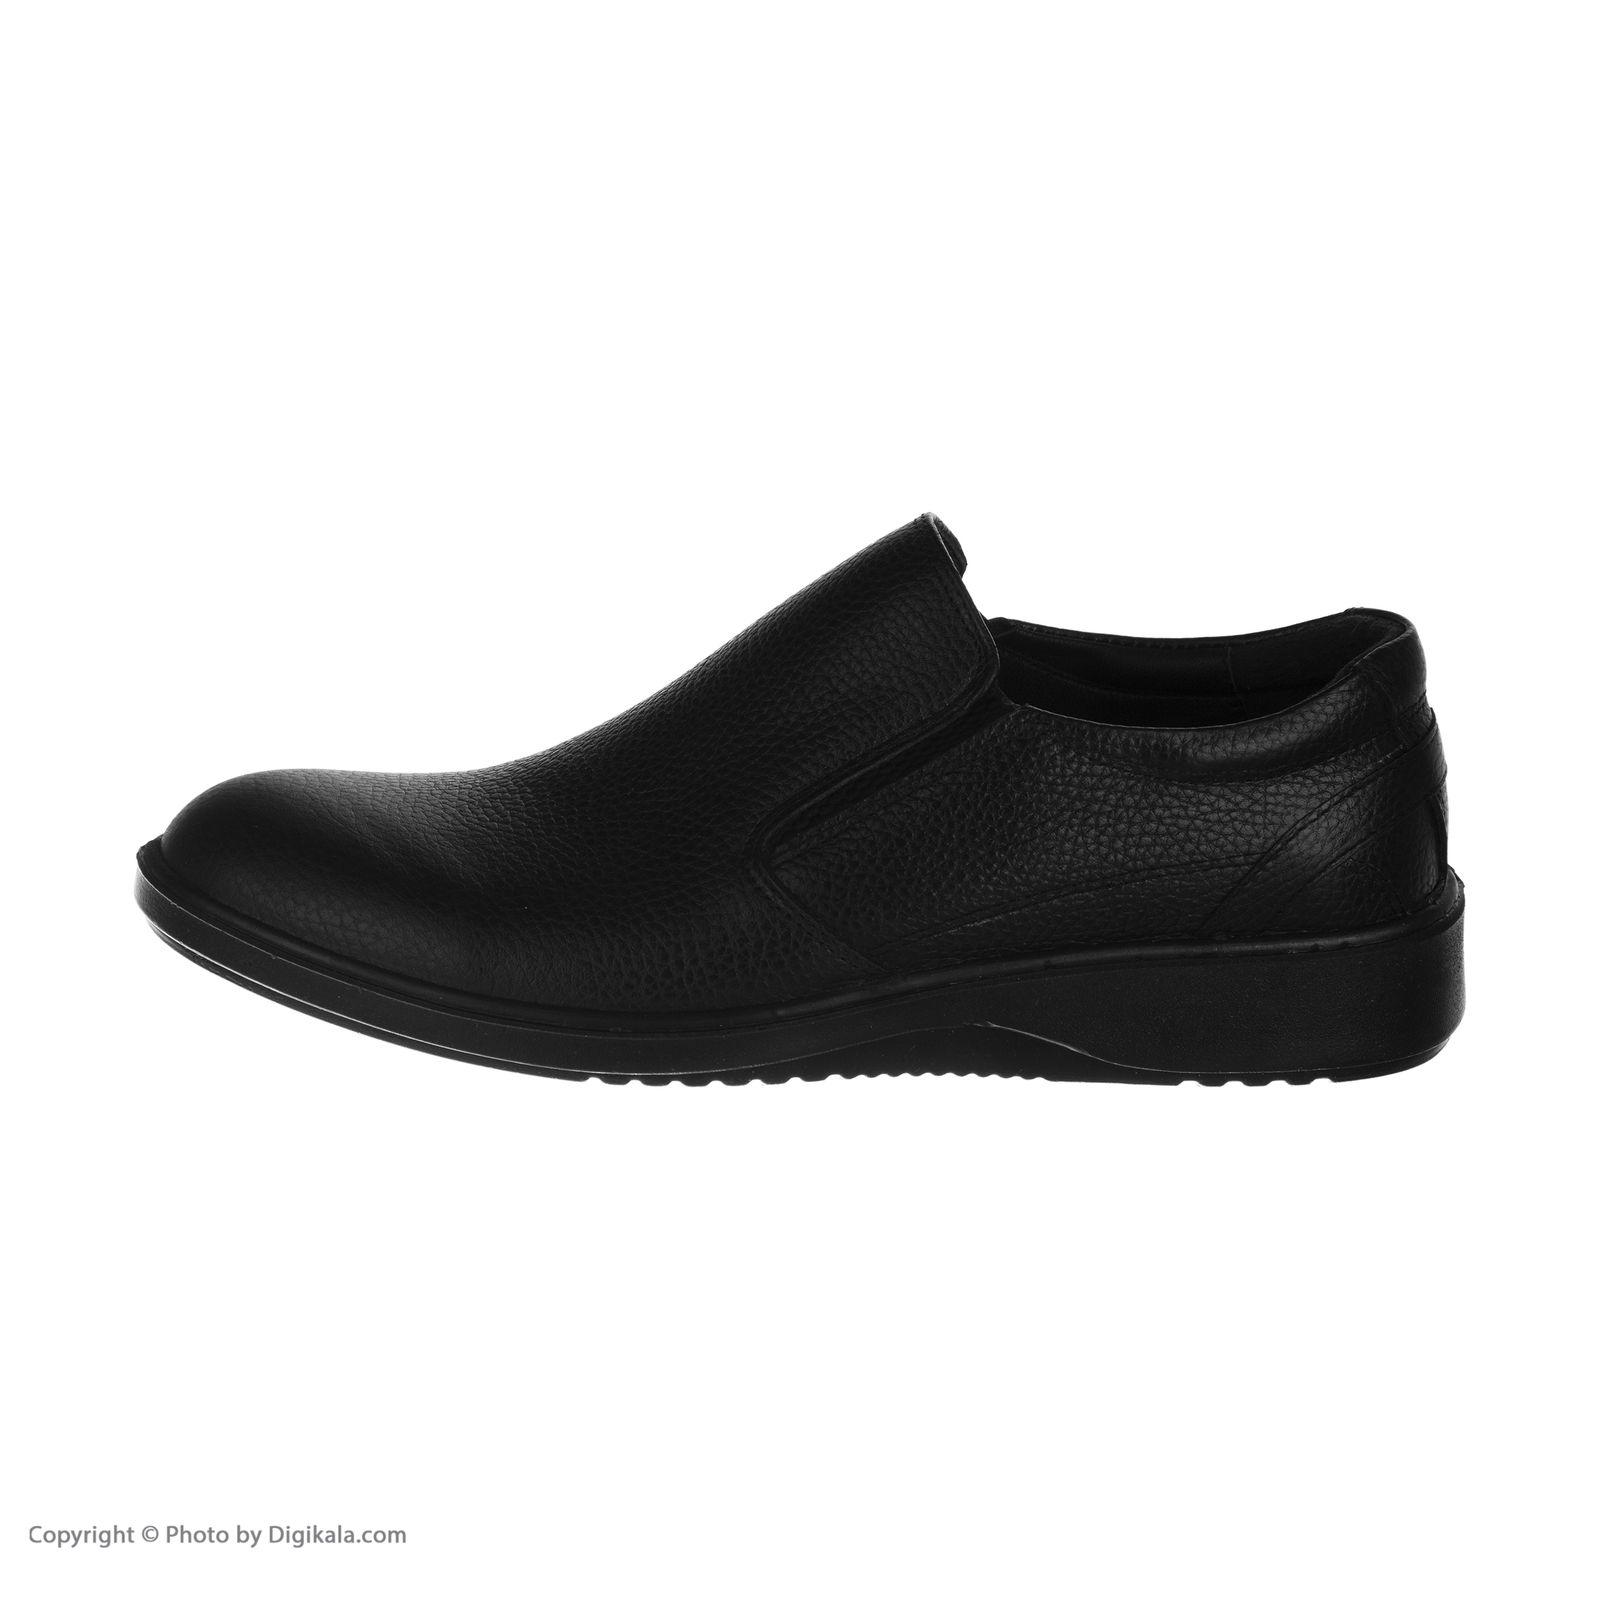 کفش روزمره مردانه ریمکس مدل 7327A503101 -  - 3